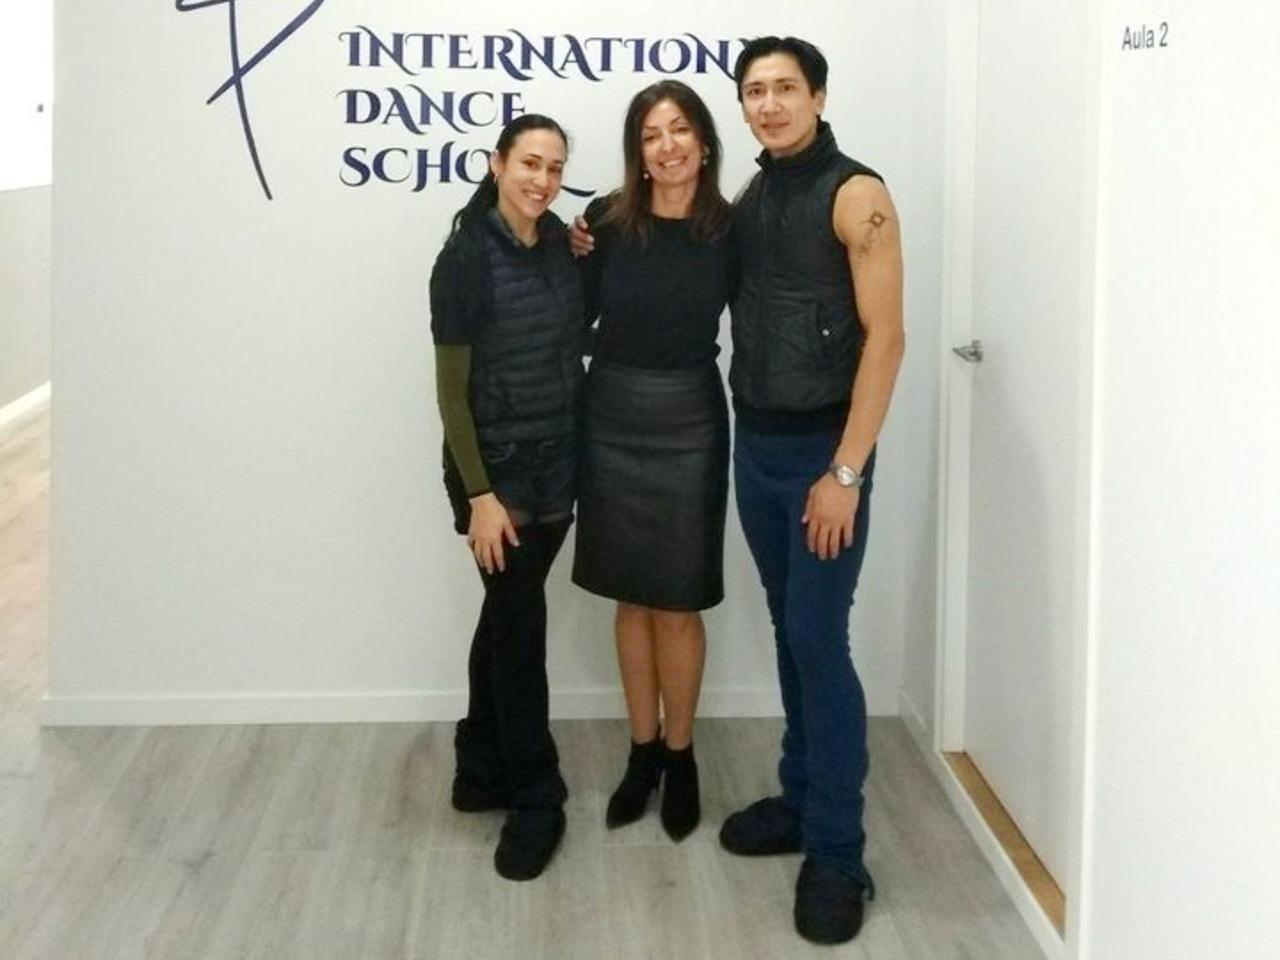 world dance fair lienz chang bailarines aalto ballet essen escuela danza internacional alicante